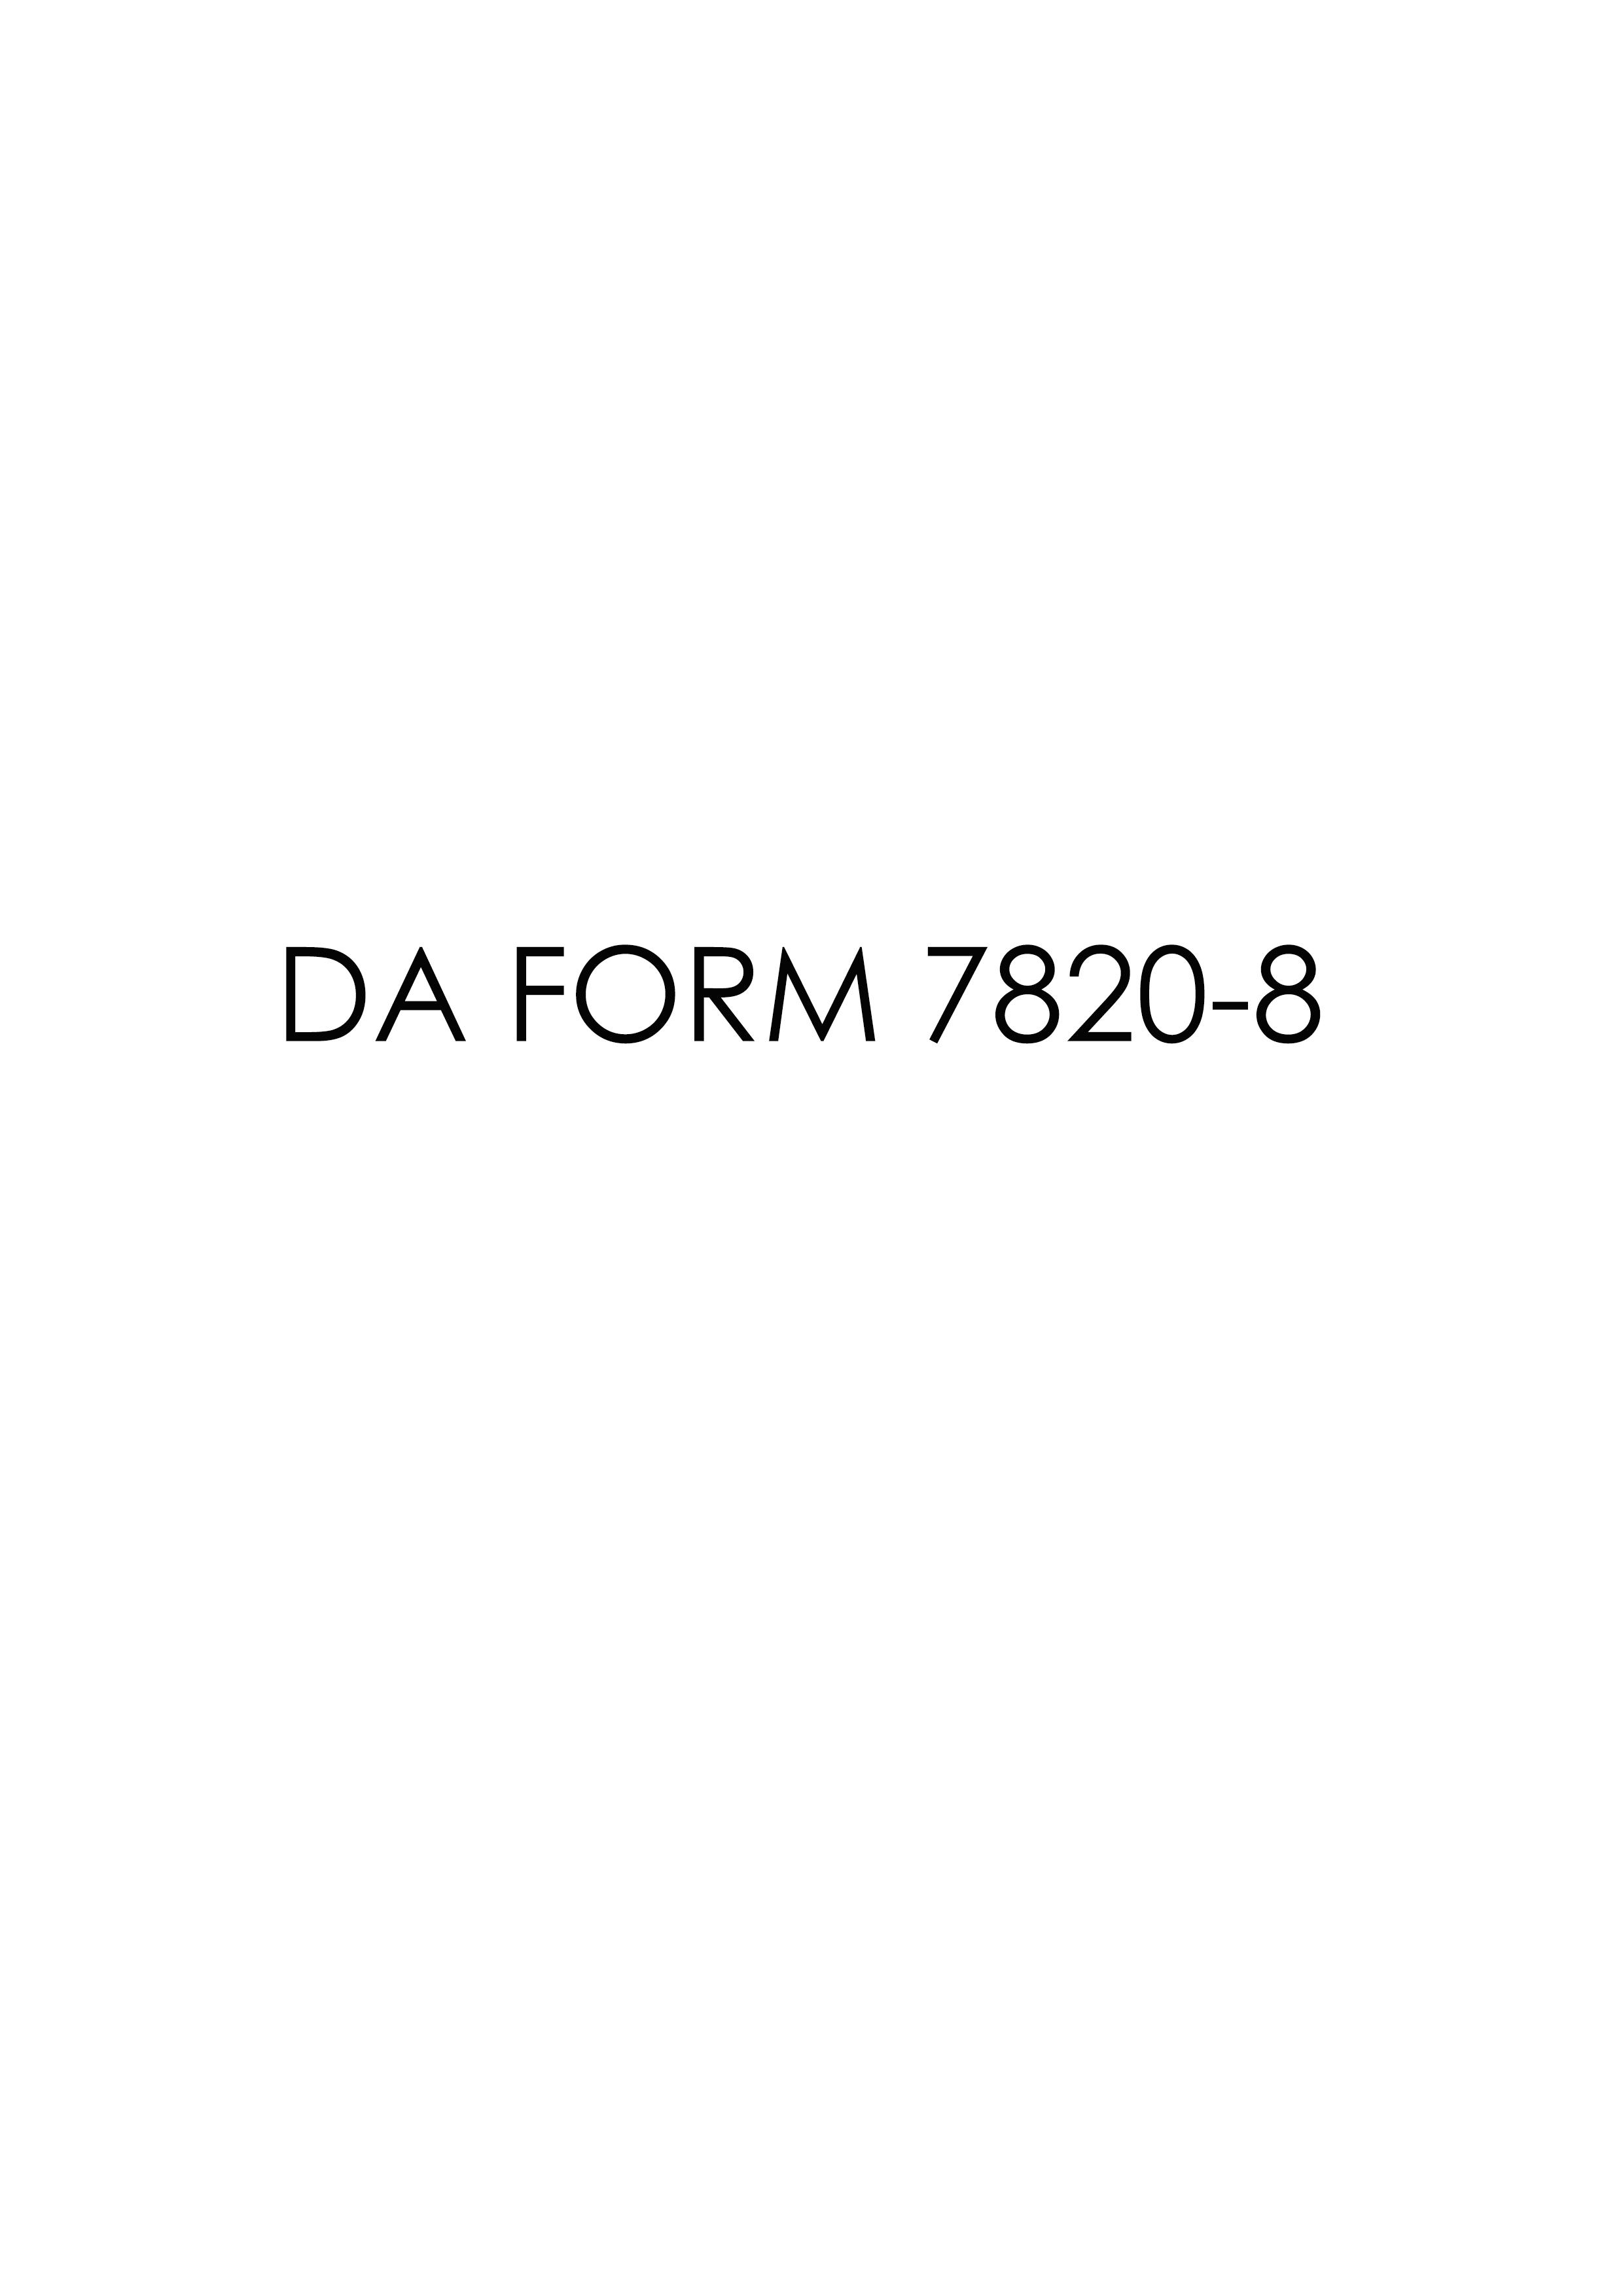 Download da Form 7820-8 Free